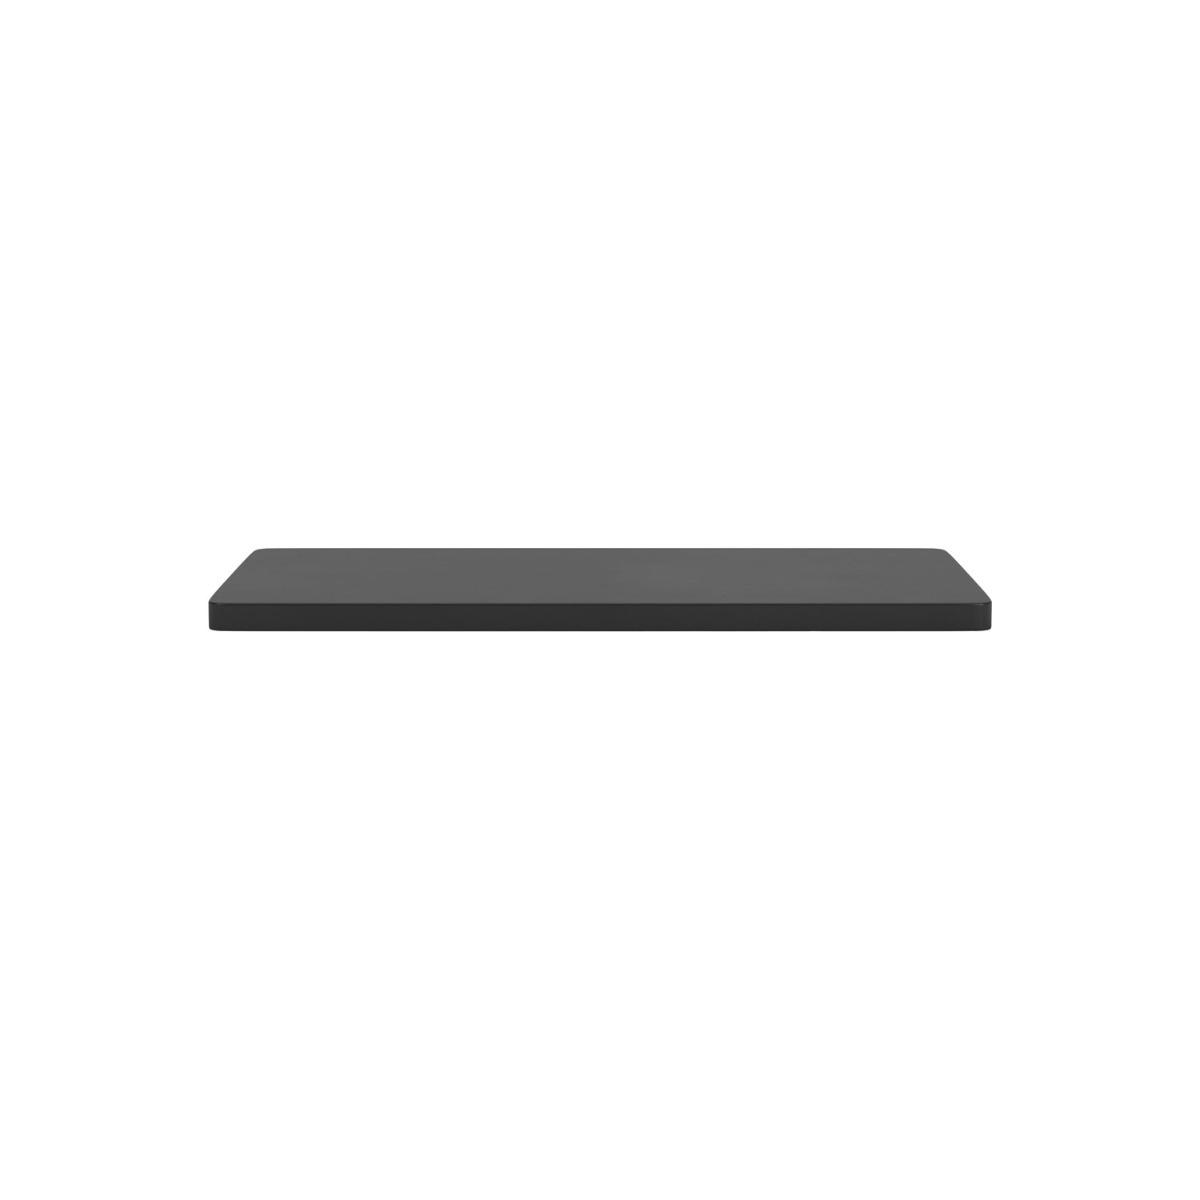 Montana Toppskiva Wire 34,8x18,8cm Black